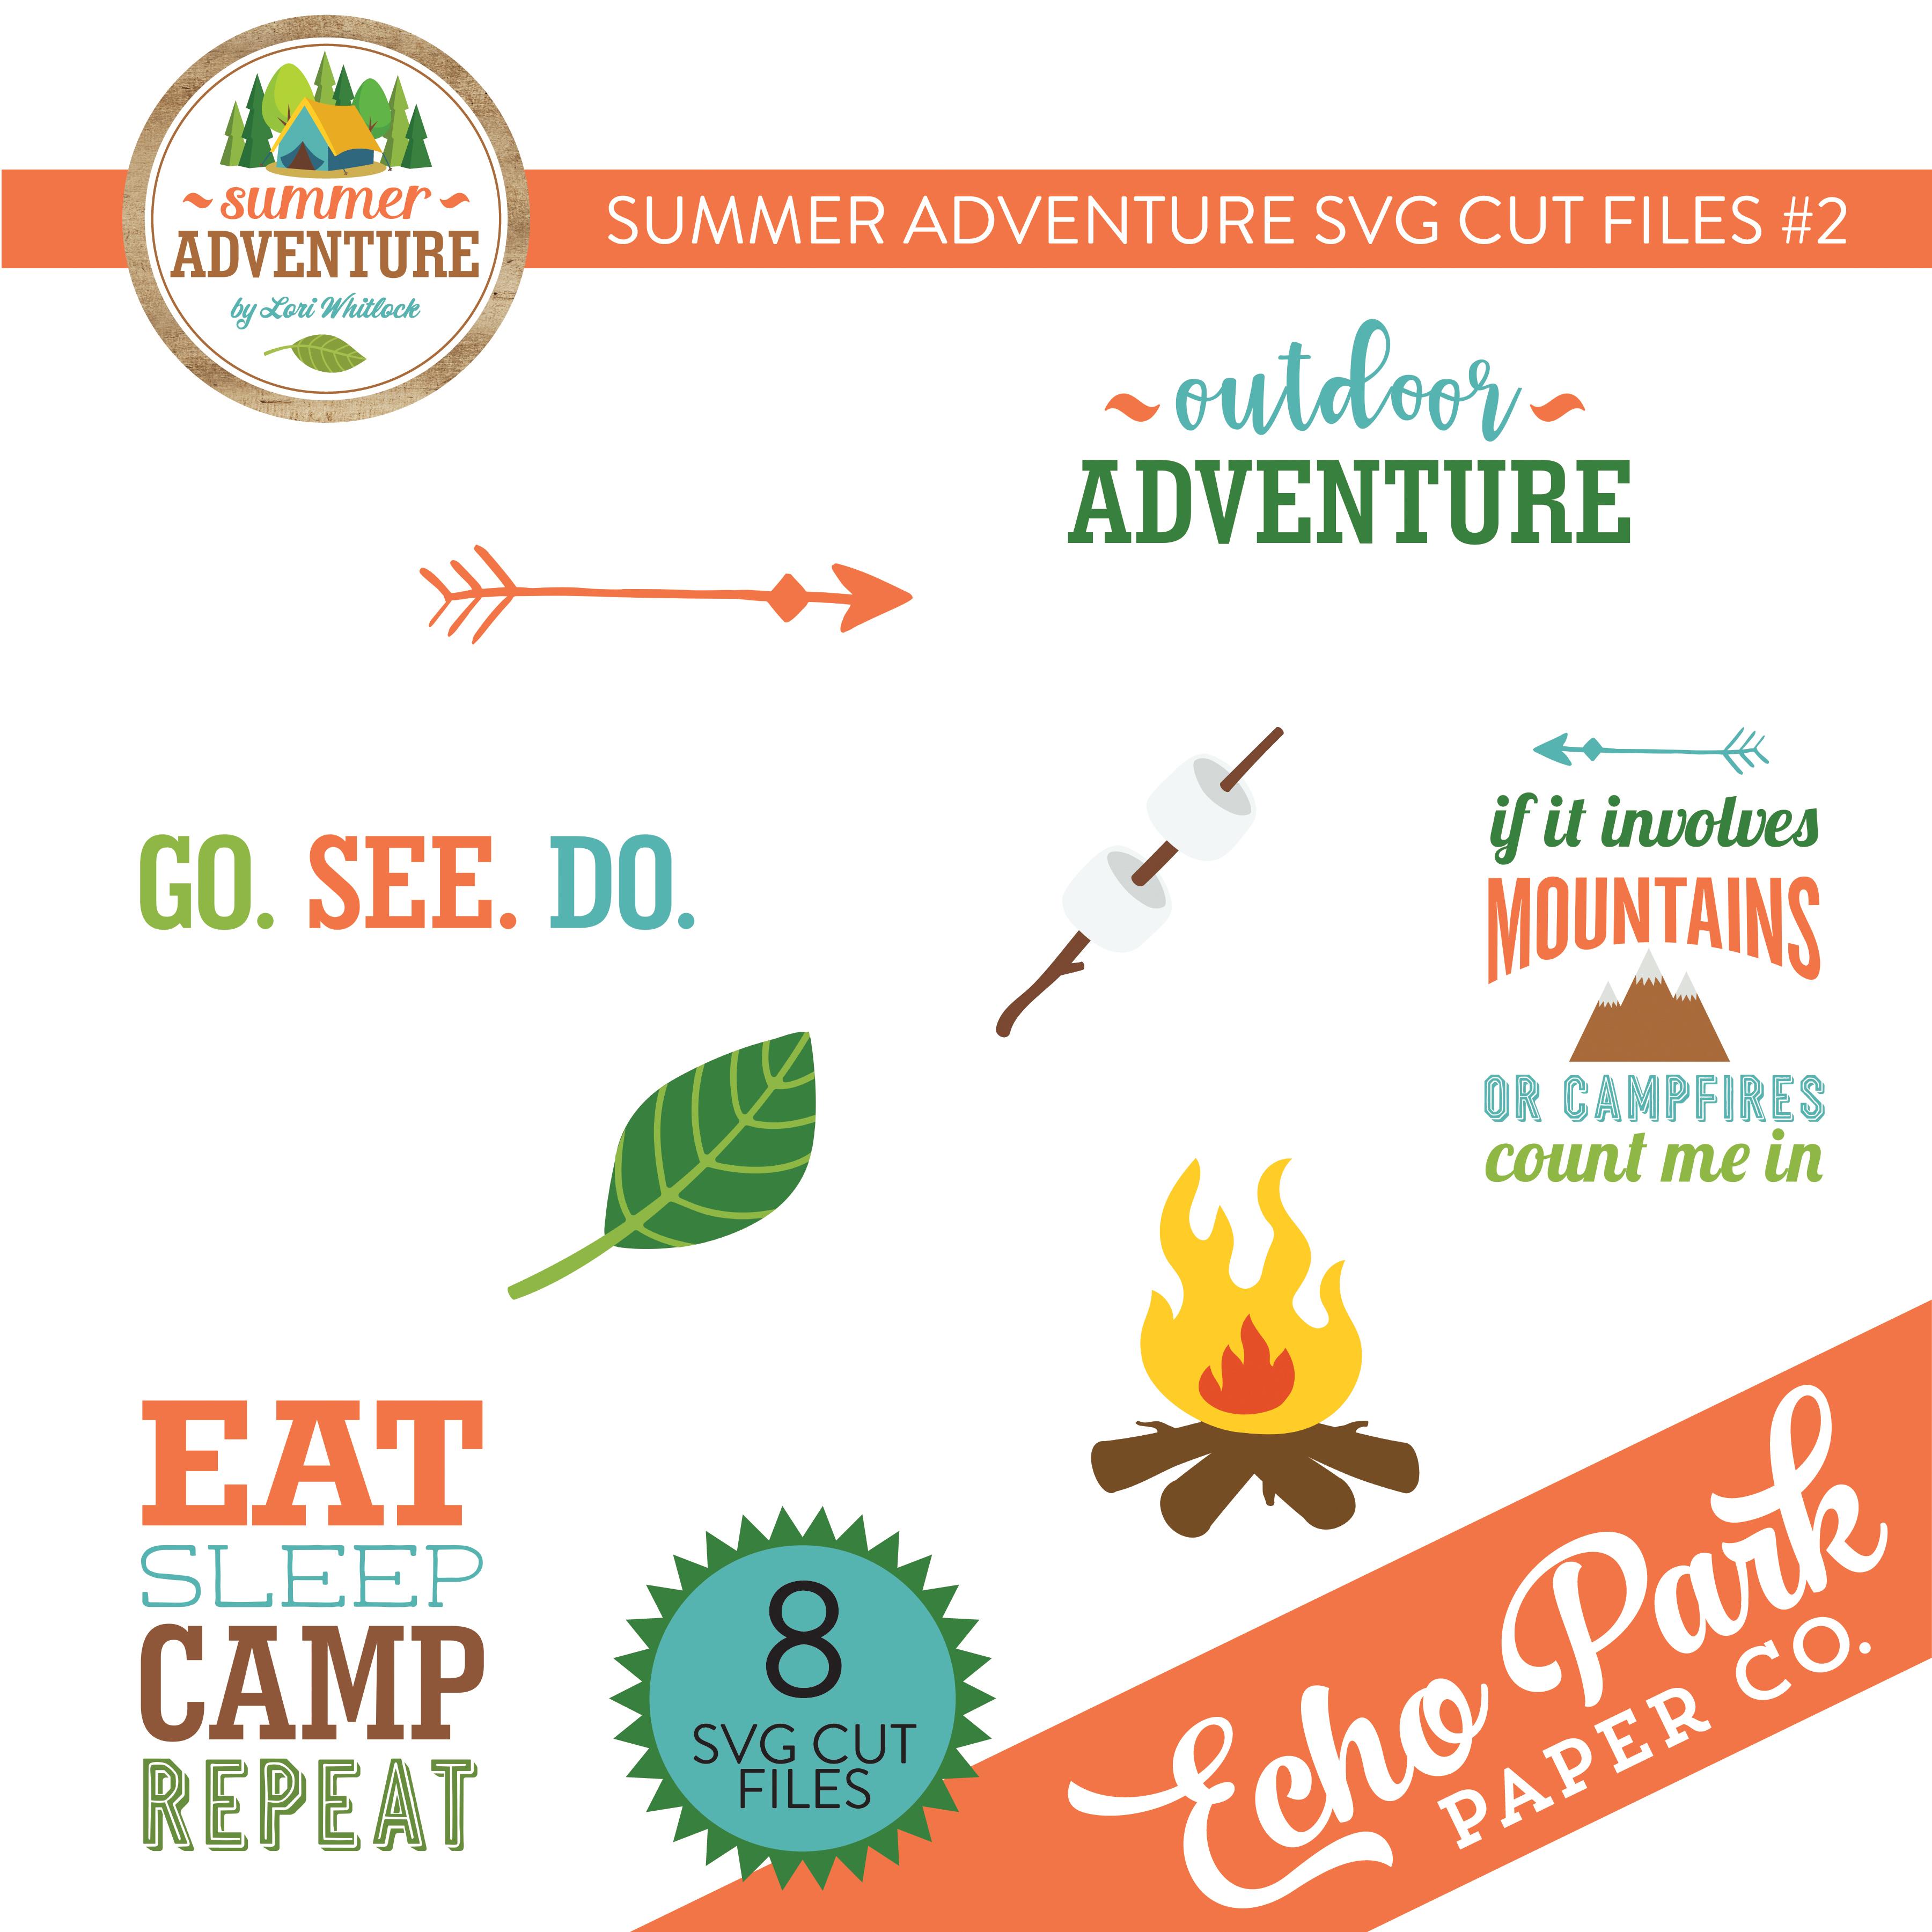 Summer Adventure SVG Cut Files #2